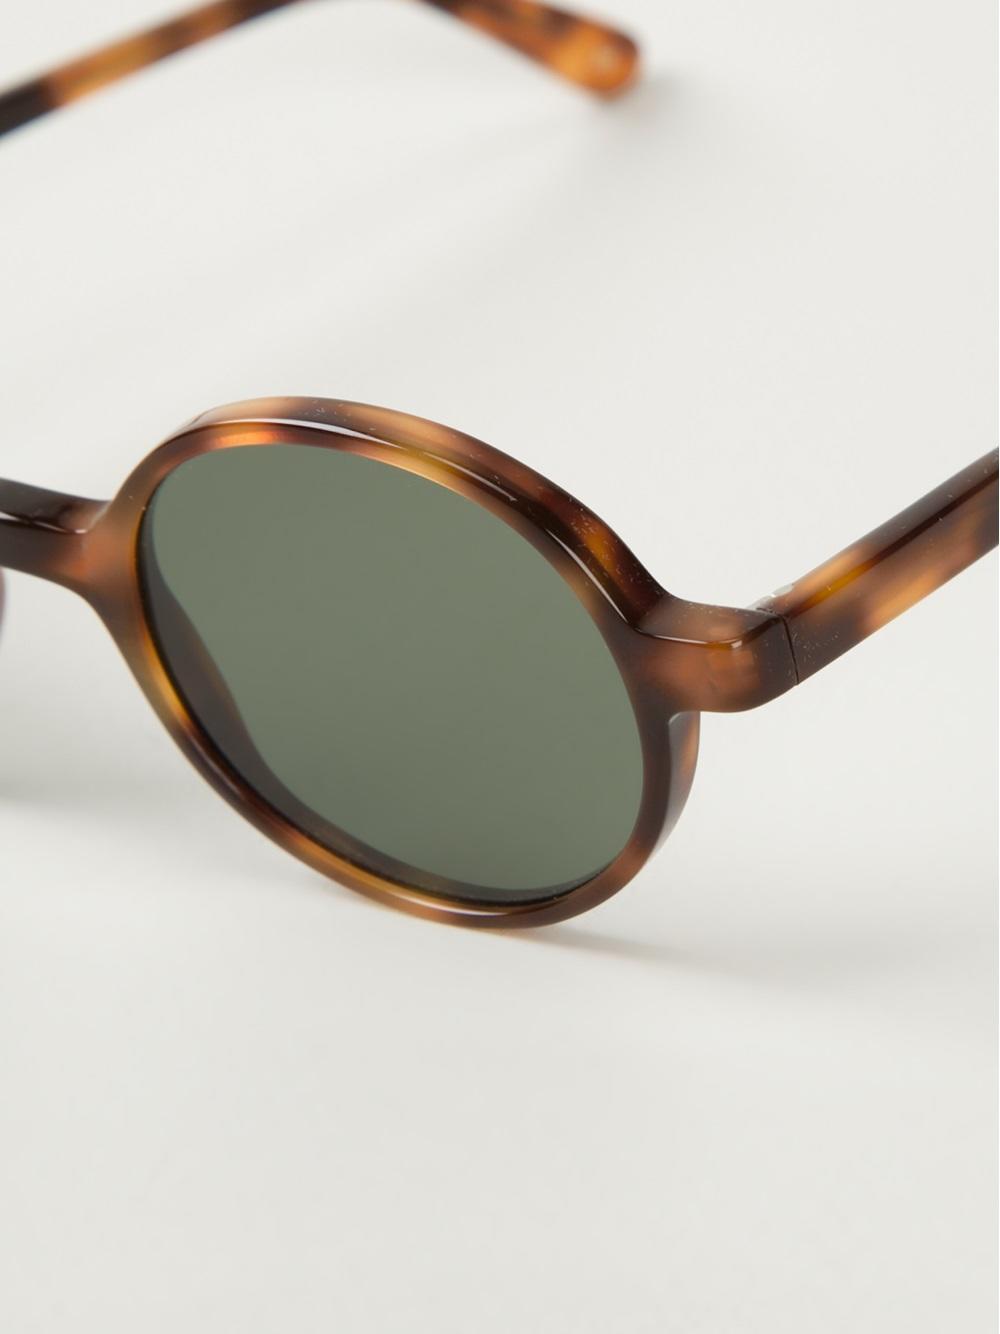 f5d4c766de5 Lgr  reunion 02  Sunglasses in Brown - Lyst